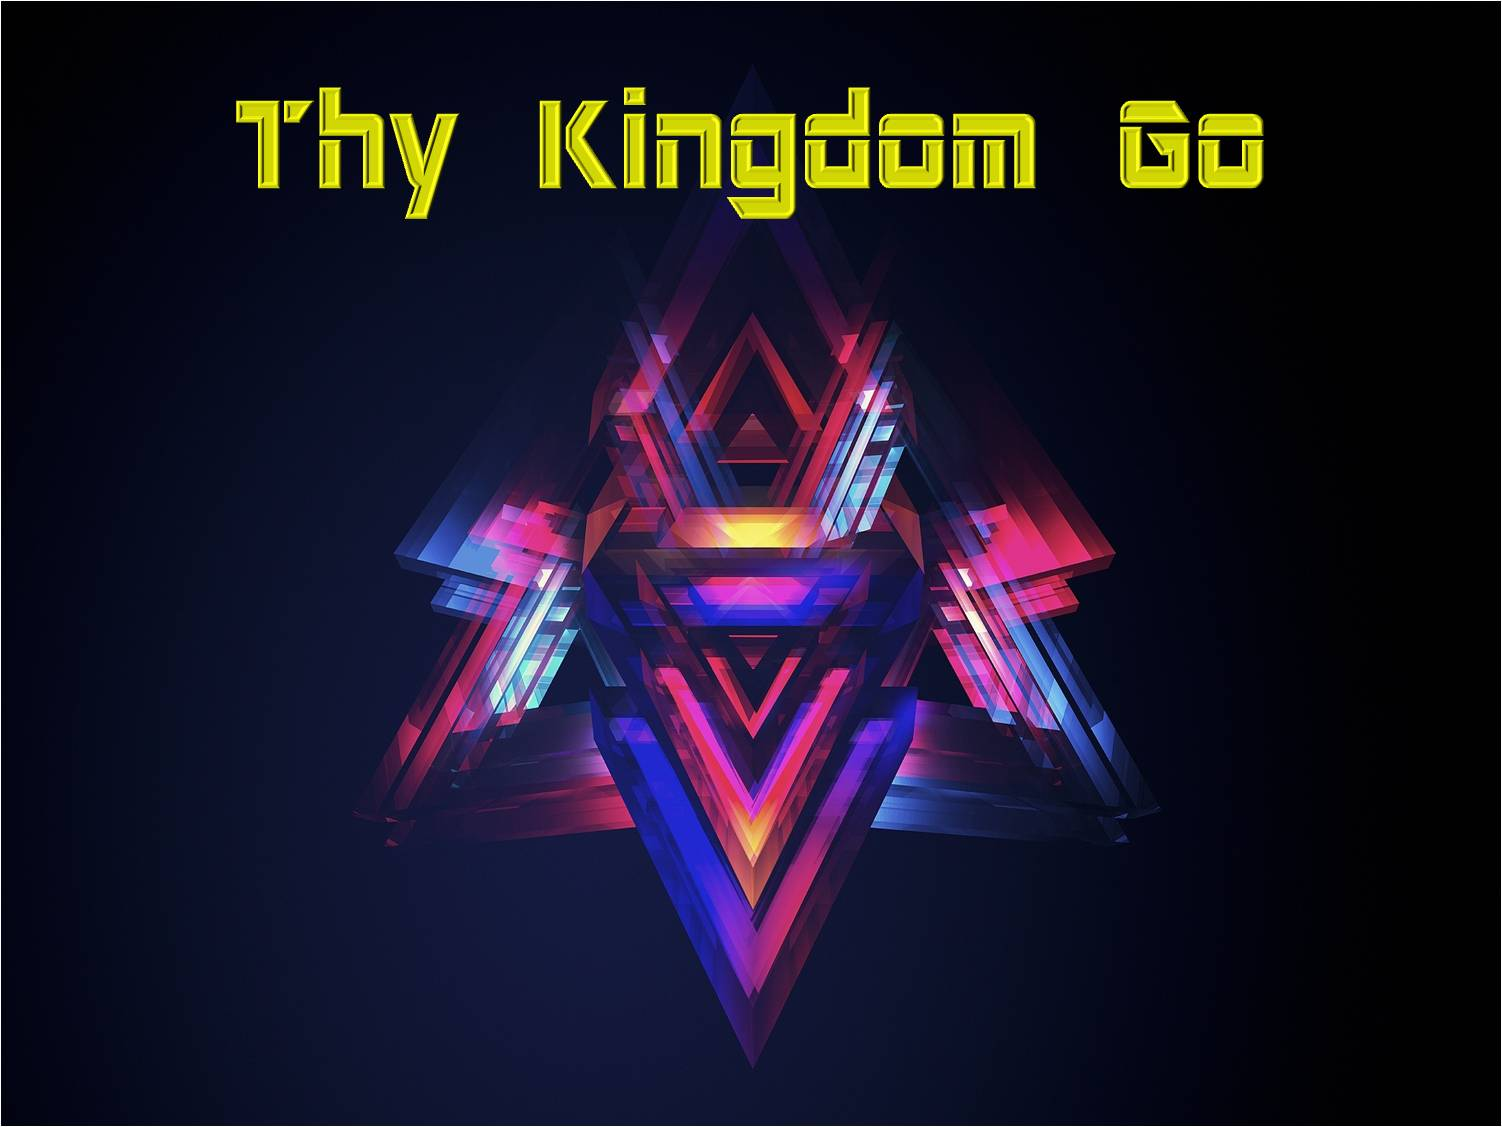 website kingdom go.jpg